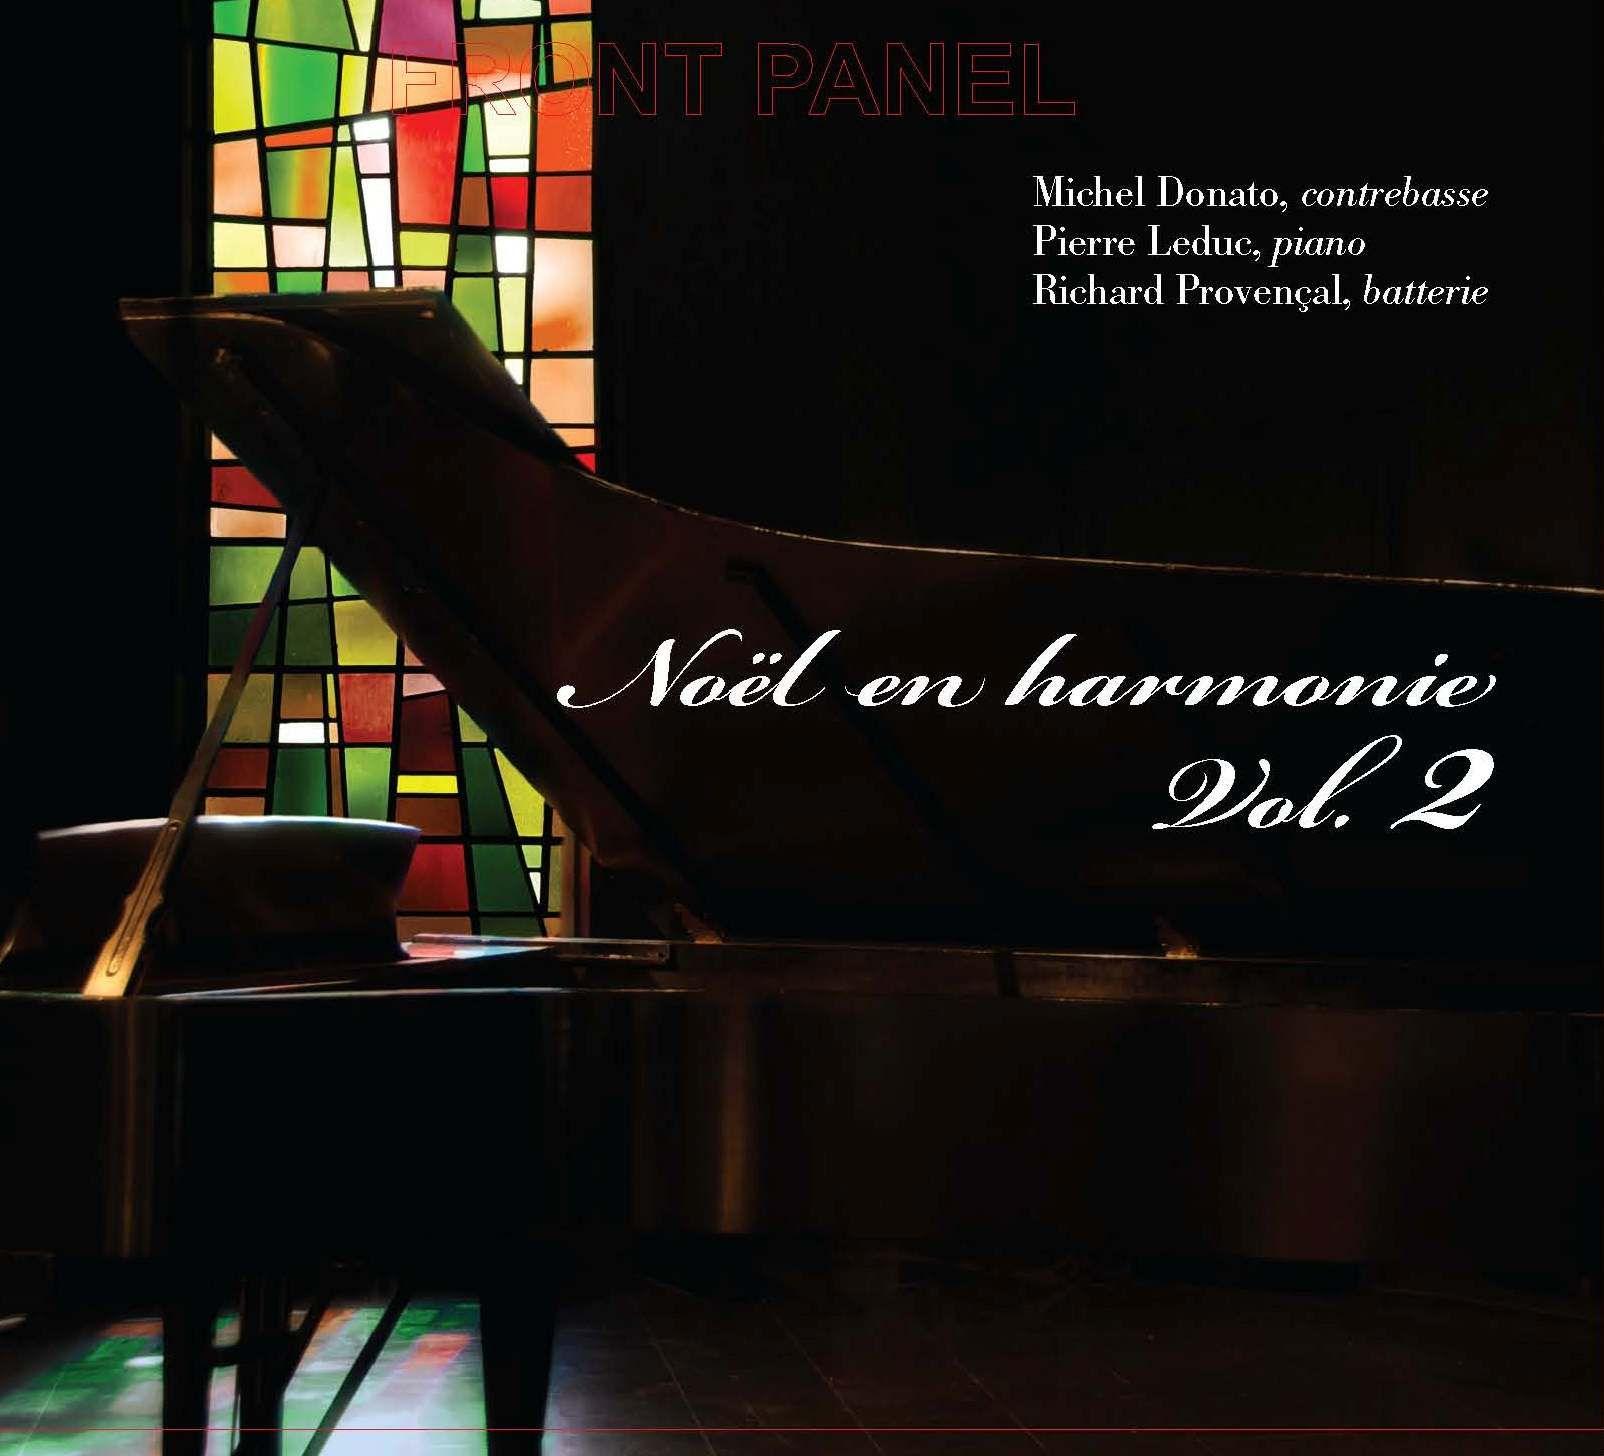 Cover Noël en harmonie vol. 2 - Donato/Leduc/Provençal